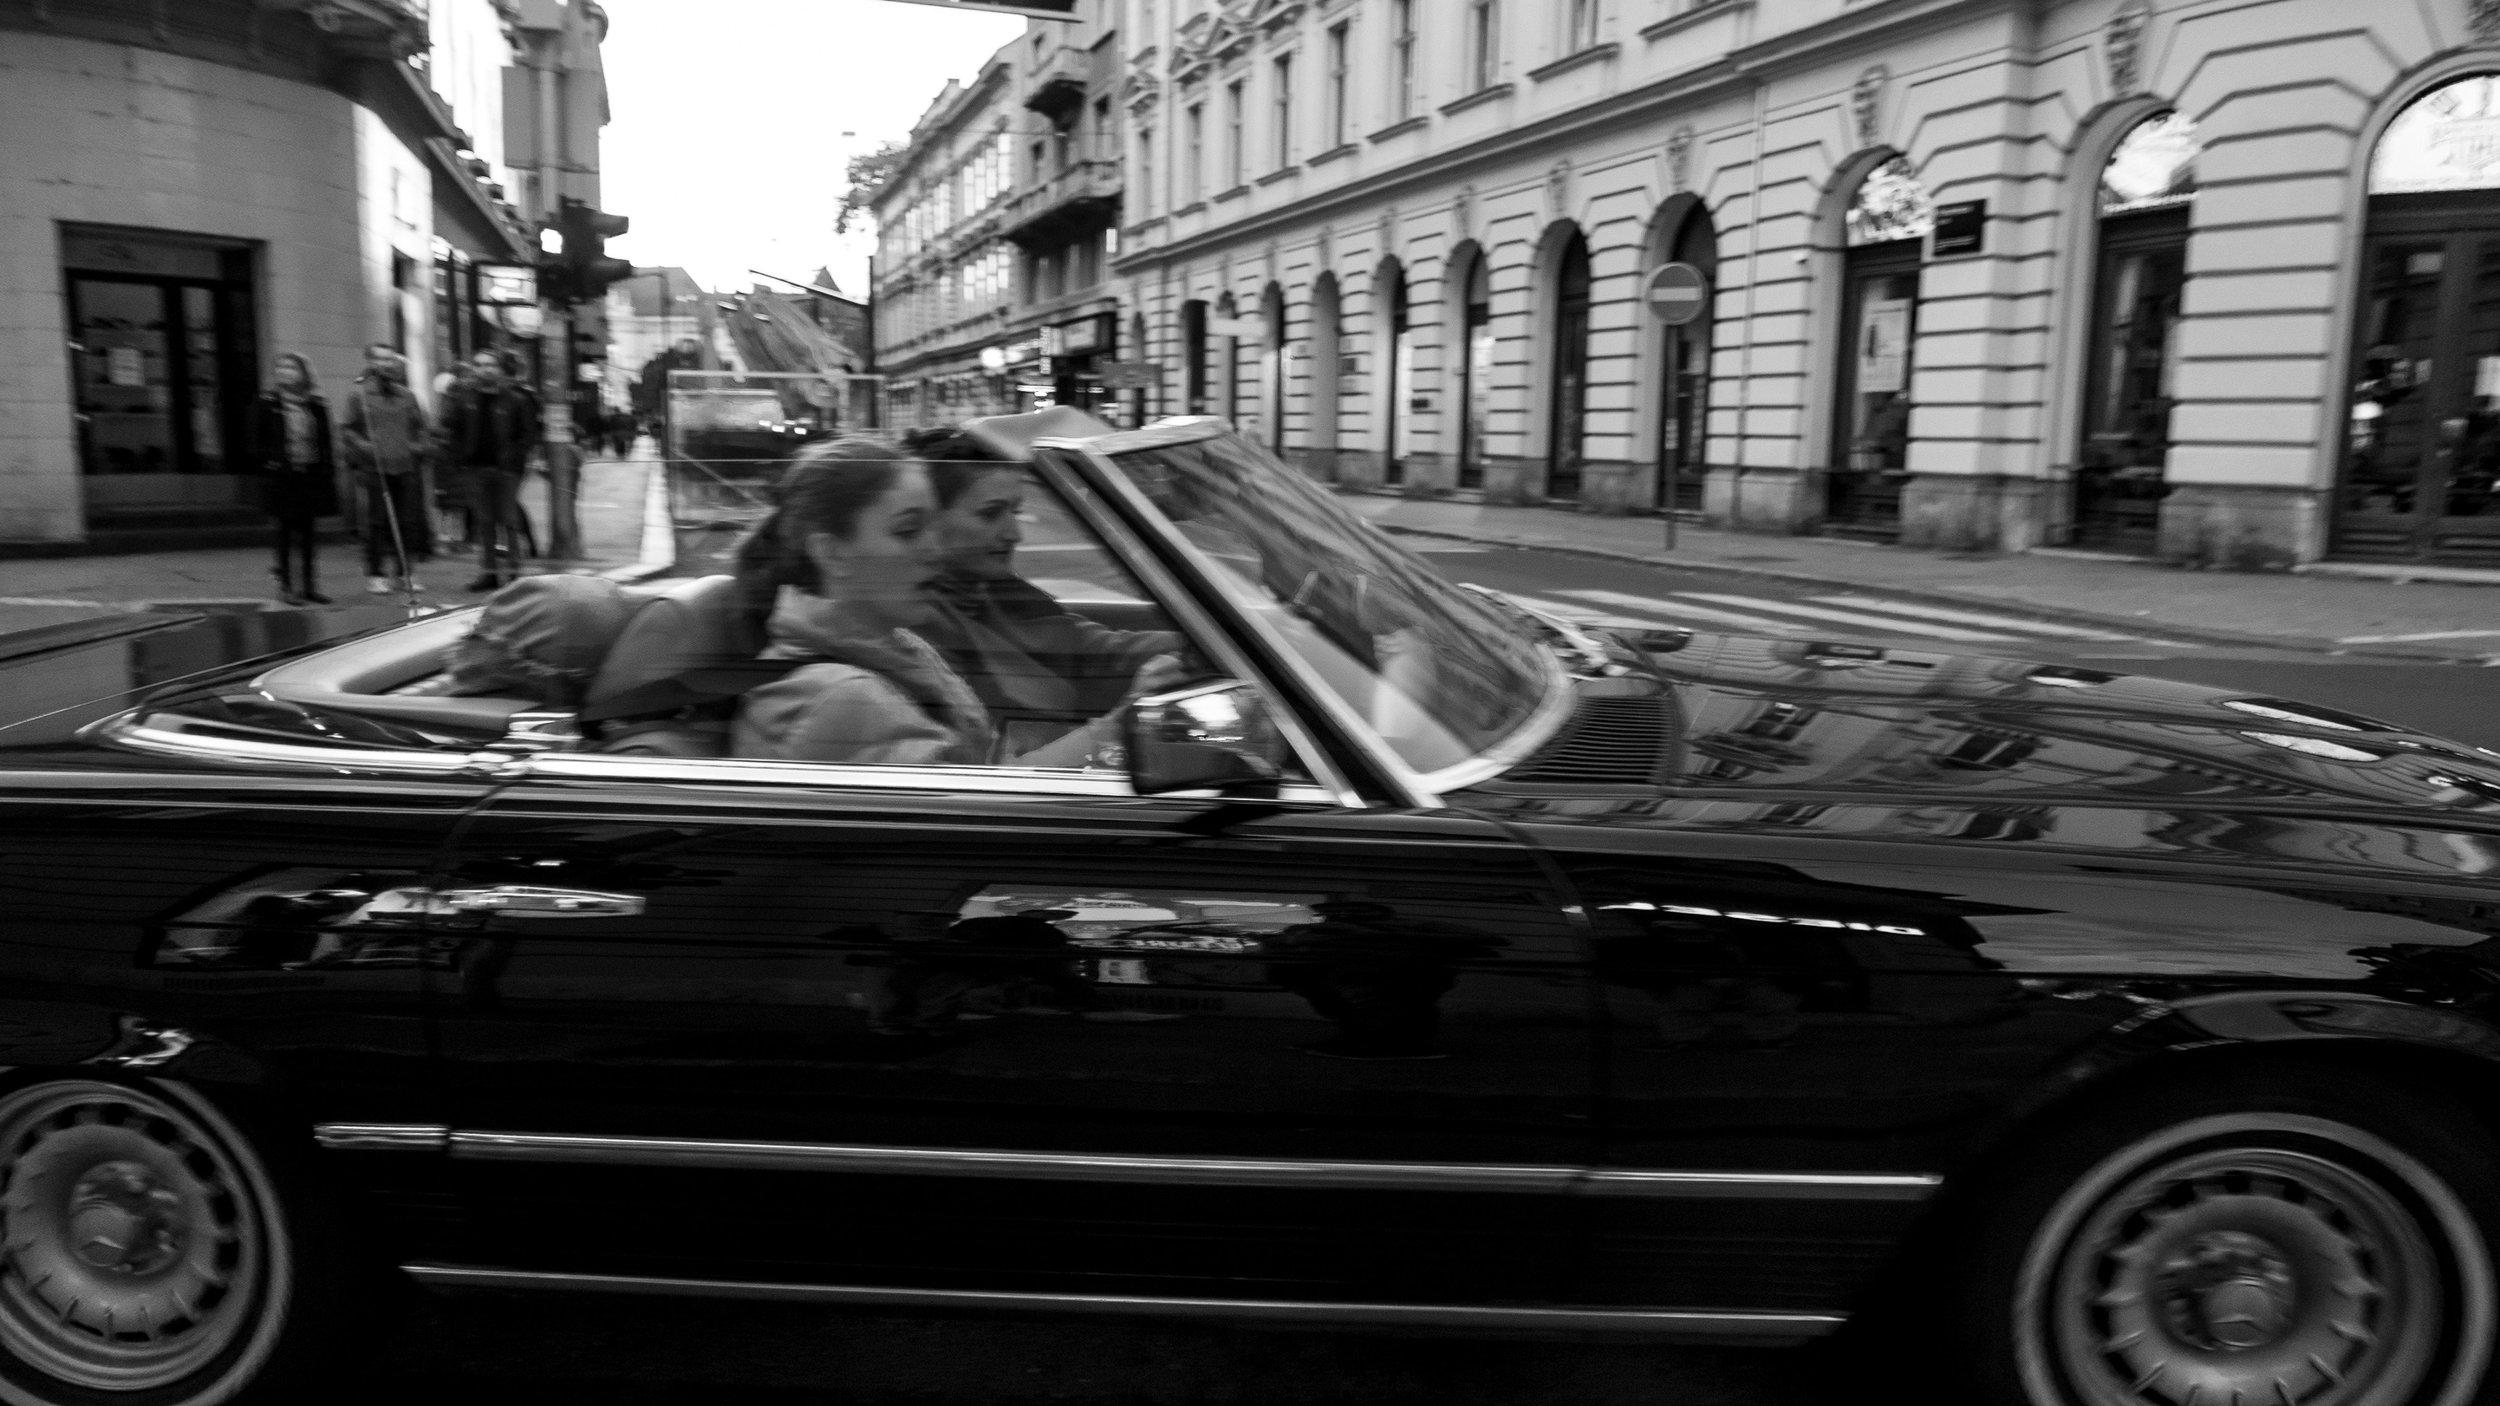 black_and_white_street_photography_10.jpg